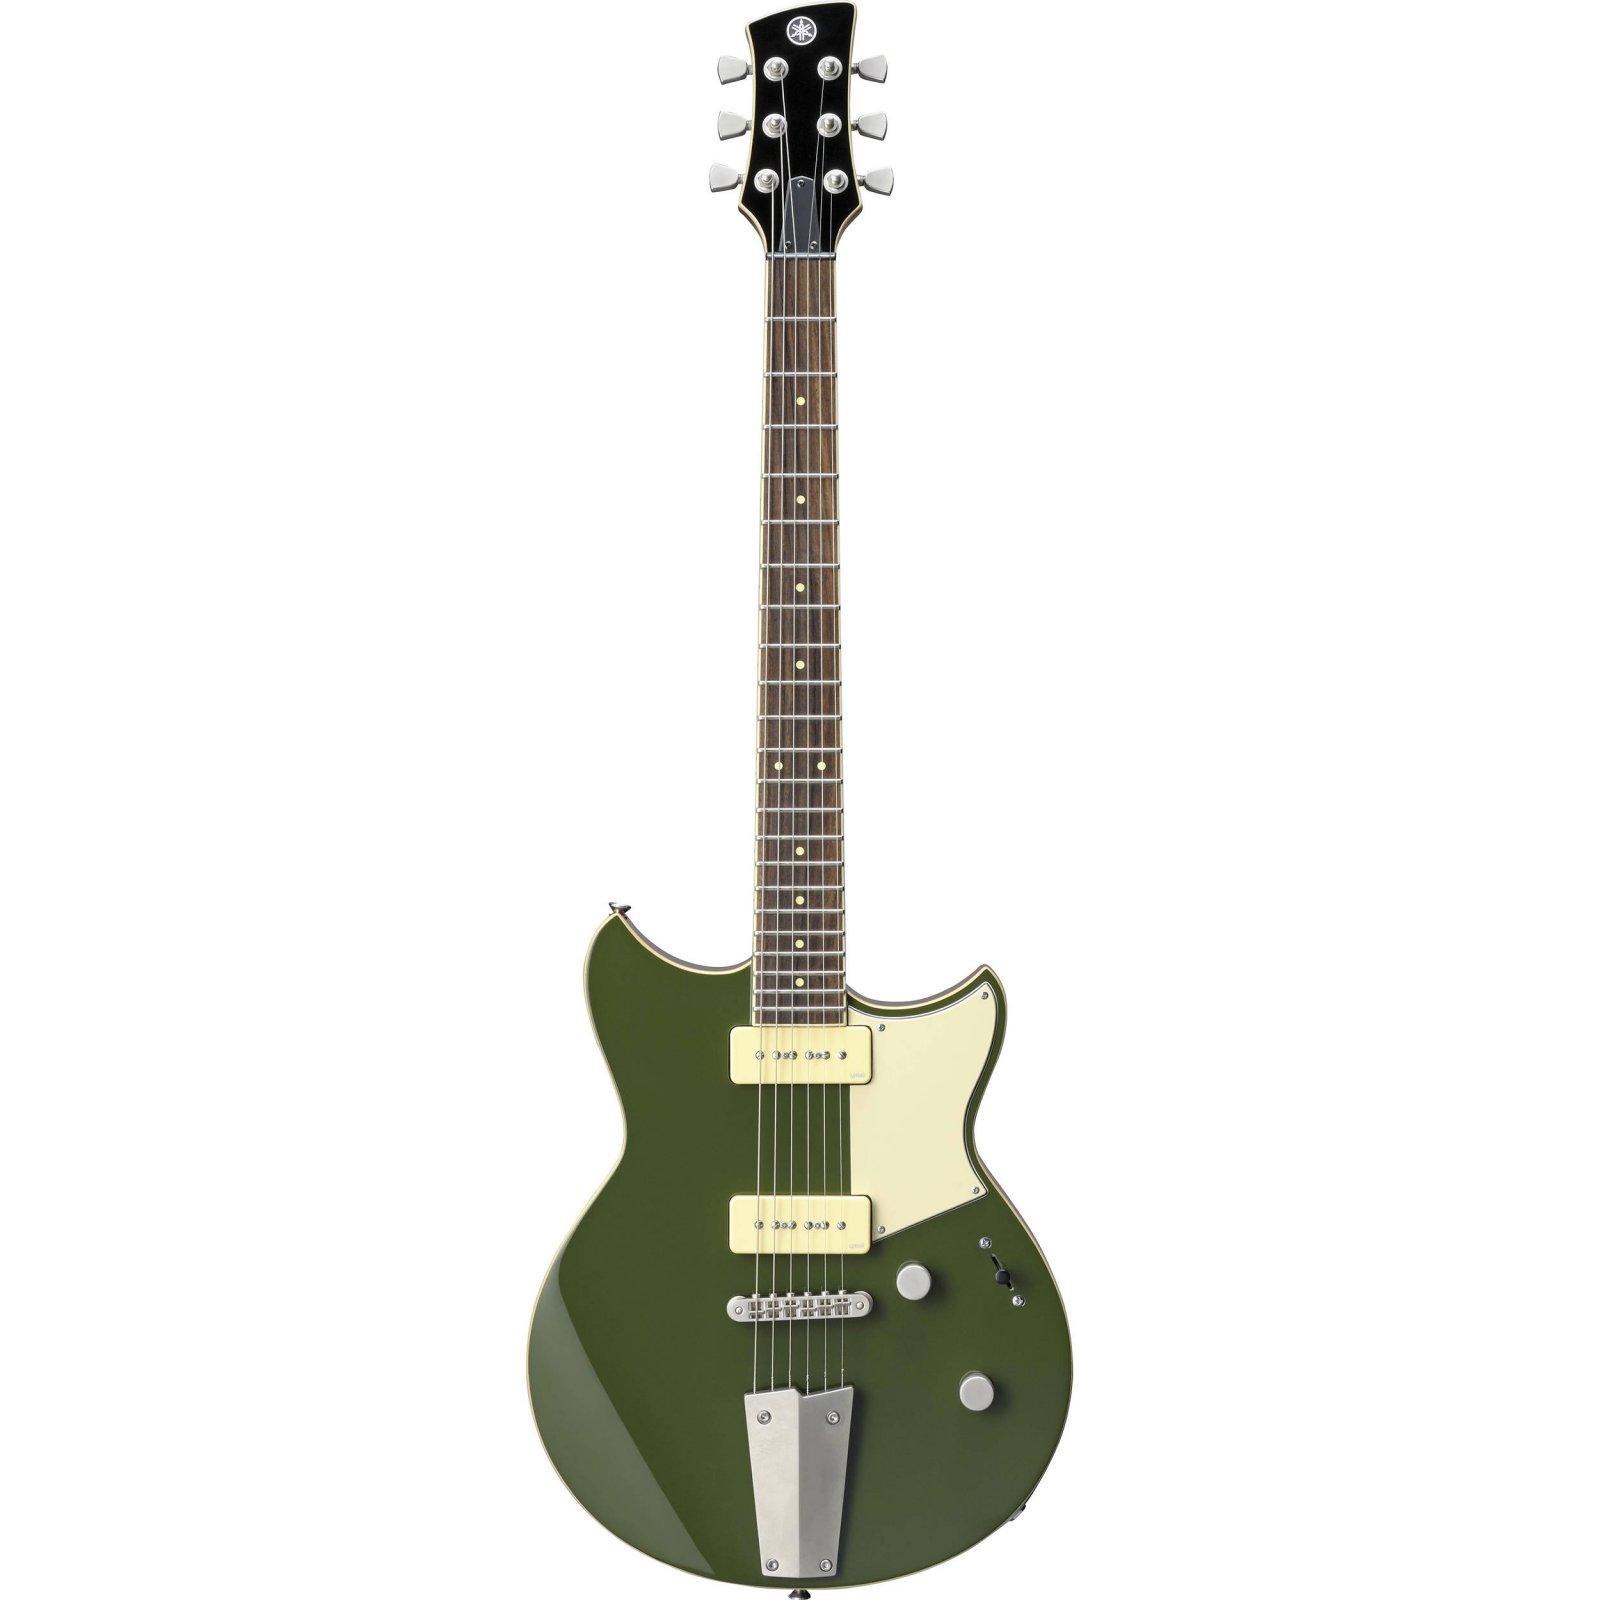 Yamaha RS502T Revstar Electric Guitar - Bowden Green